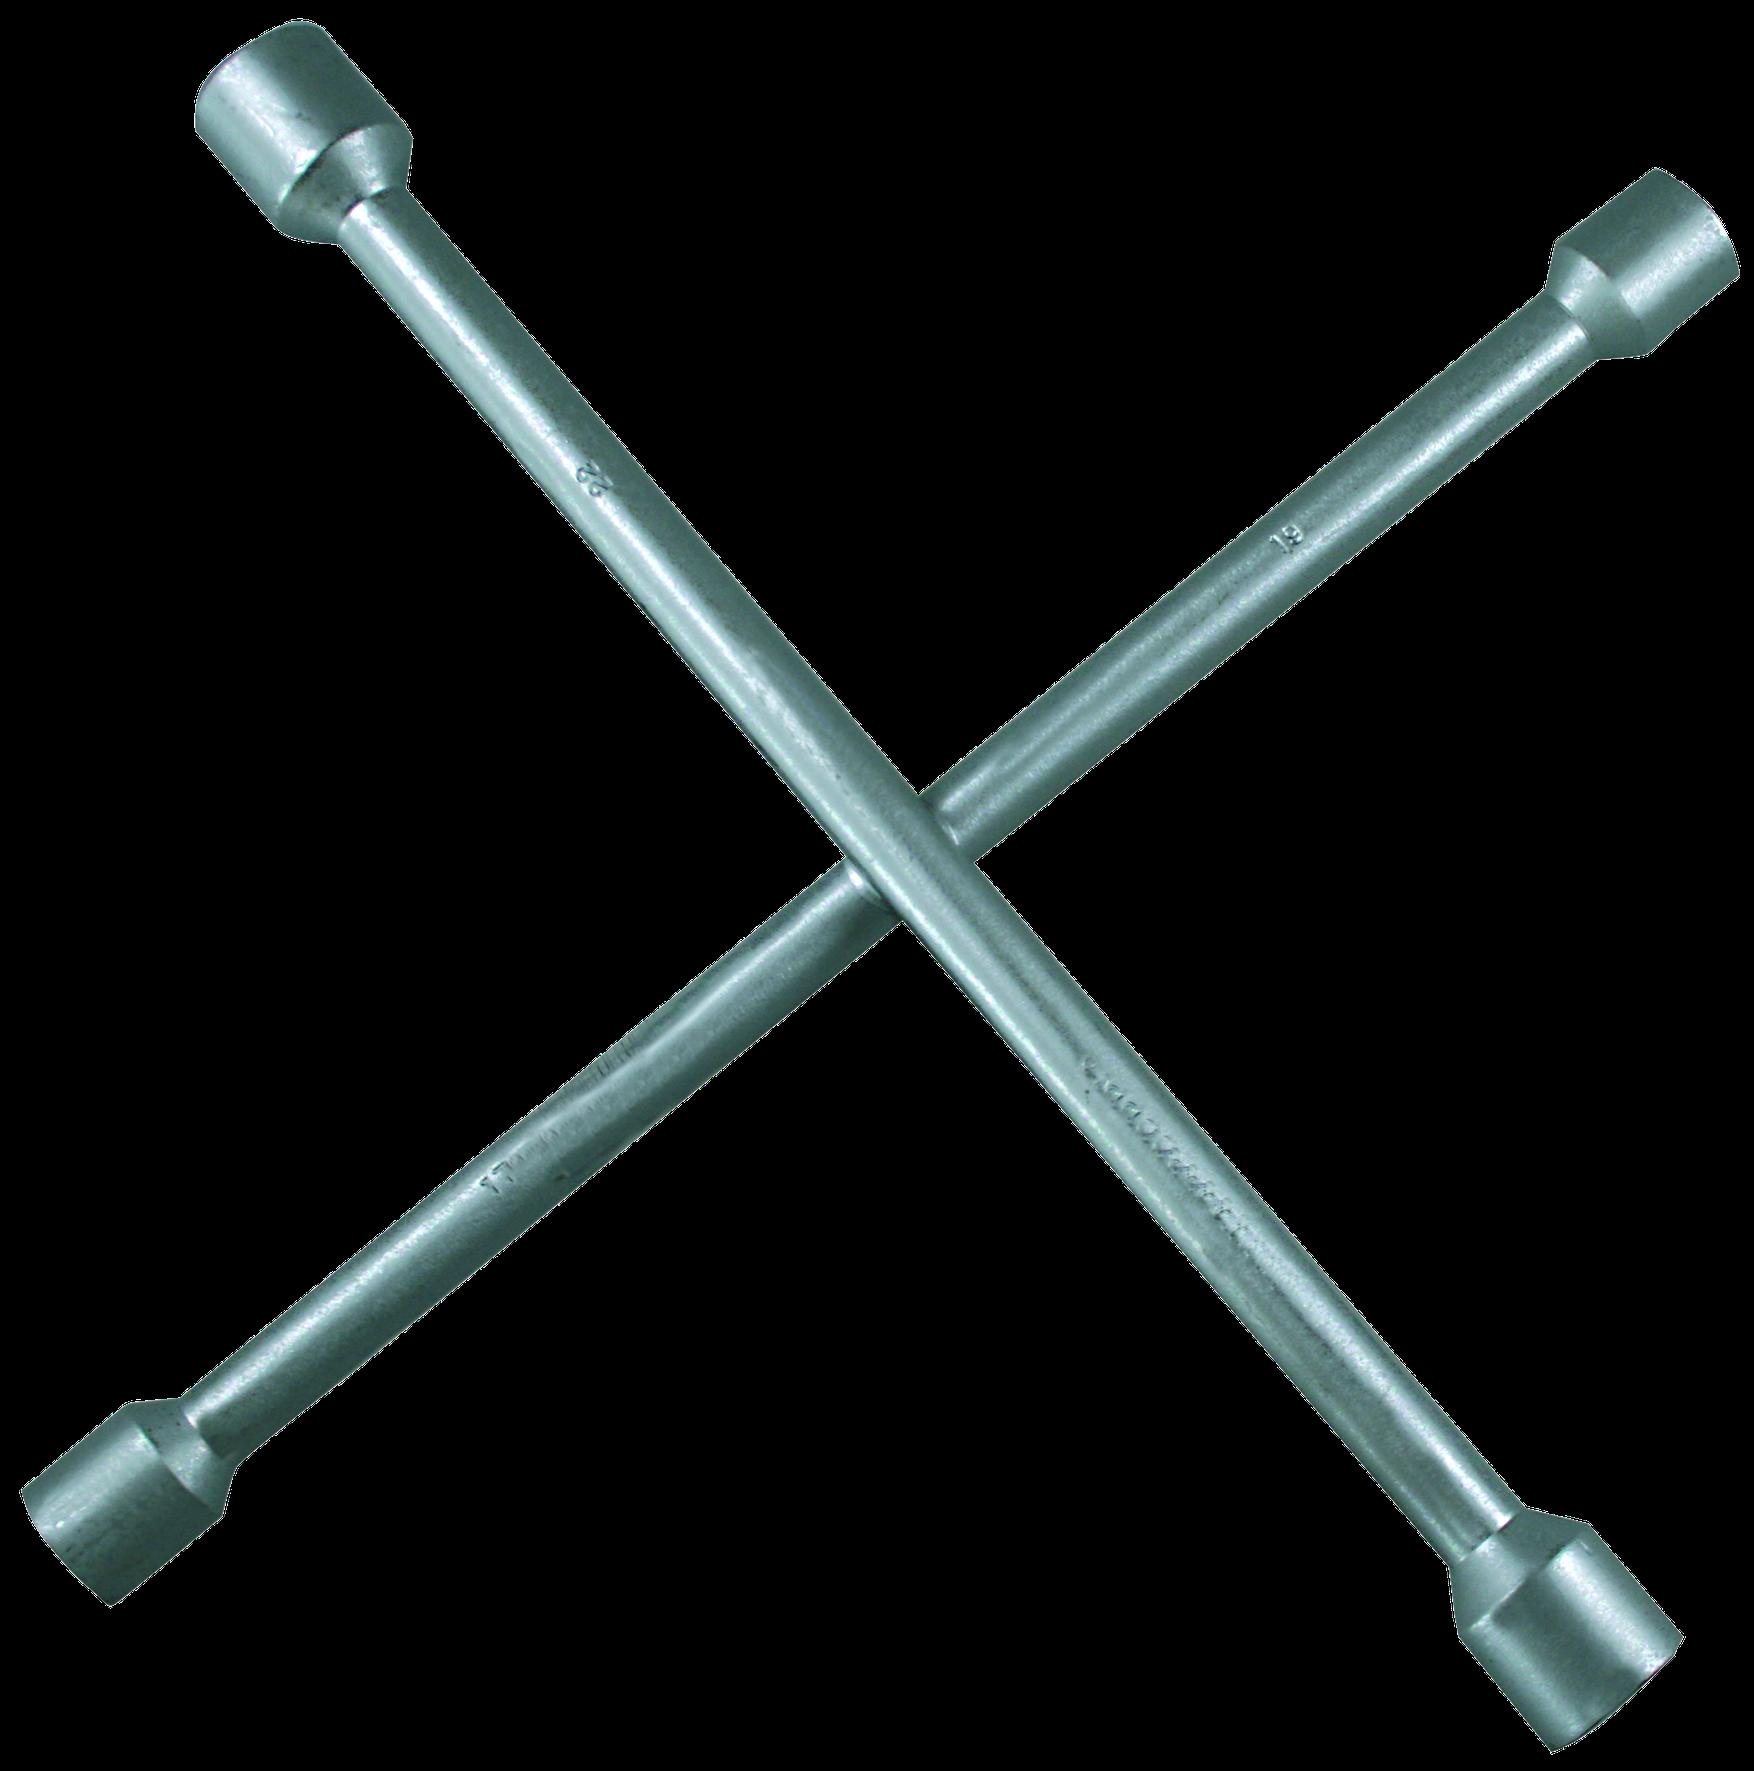 SW-Stahl  02102L Four-way lug wrench Length: 335mm